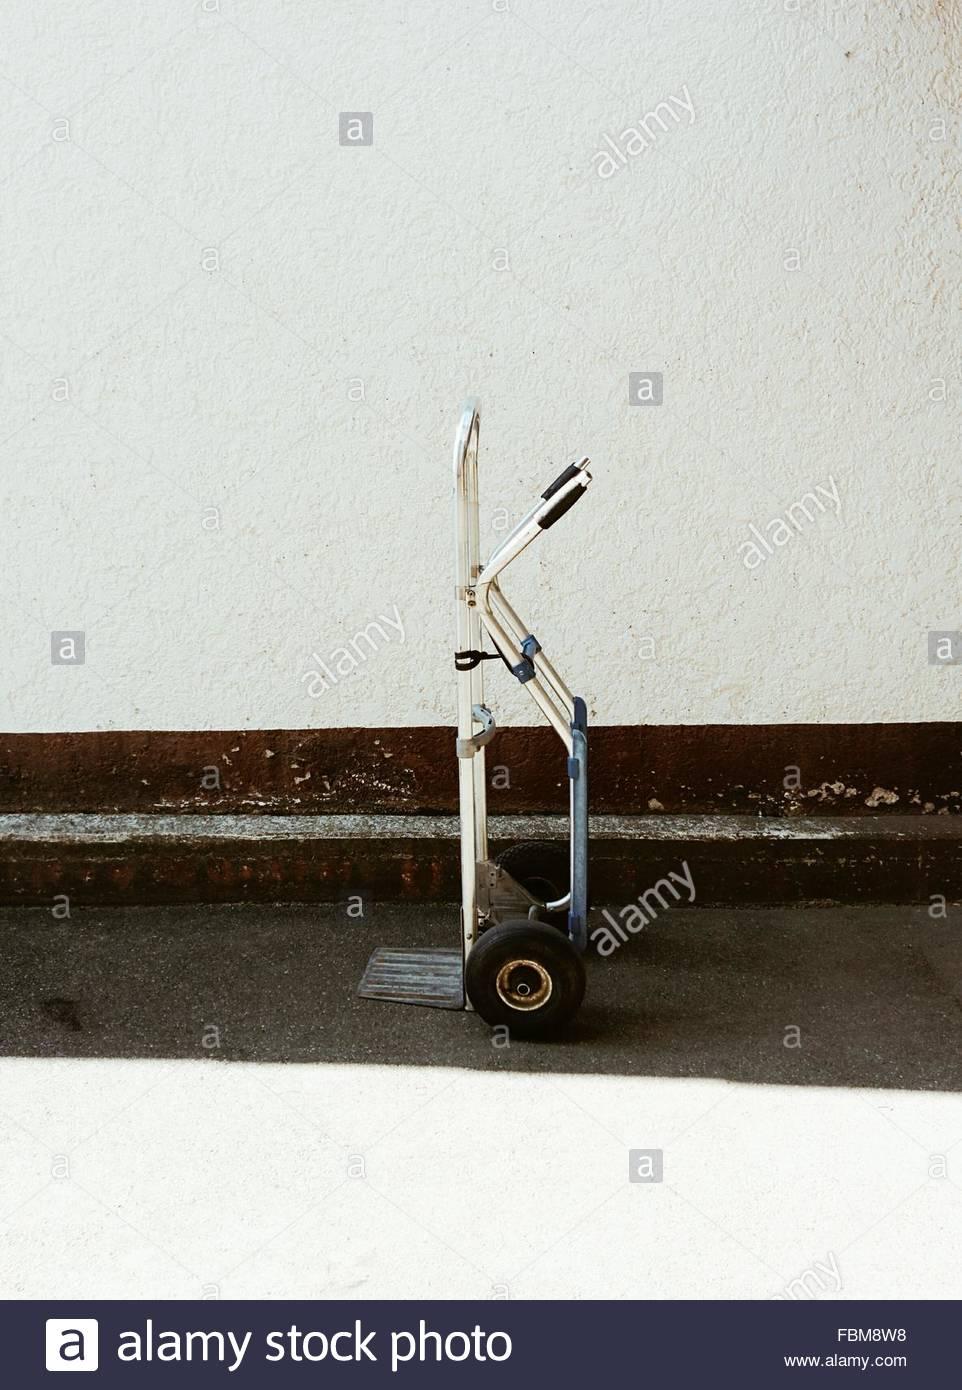 Vista lateral del objeto de ruedas contra la pared Imagen De Stock